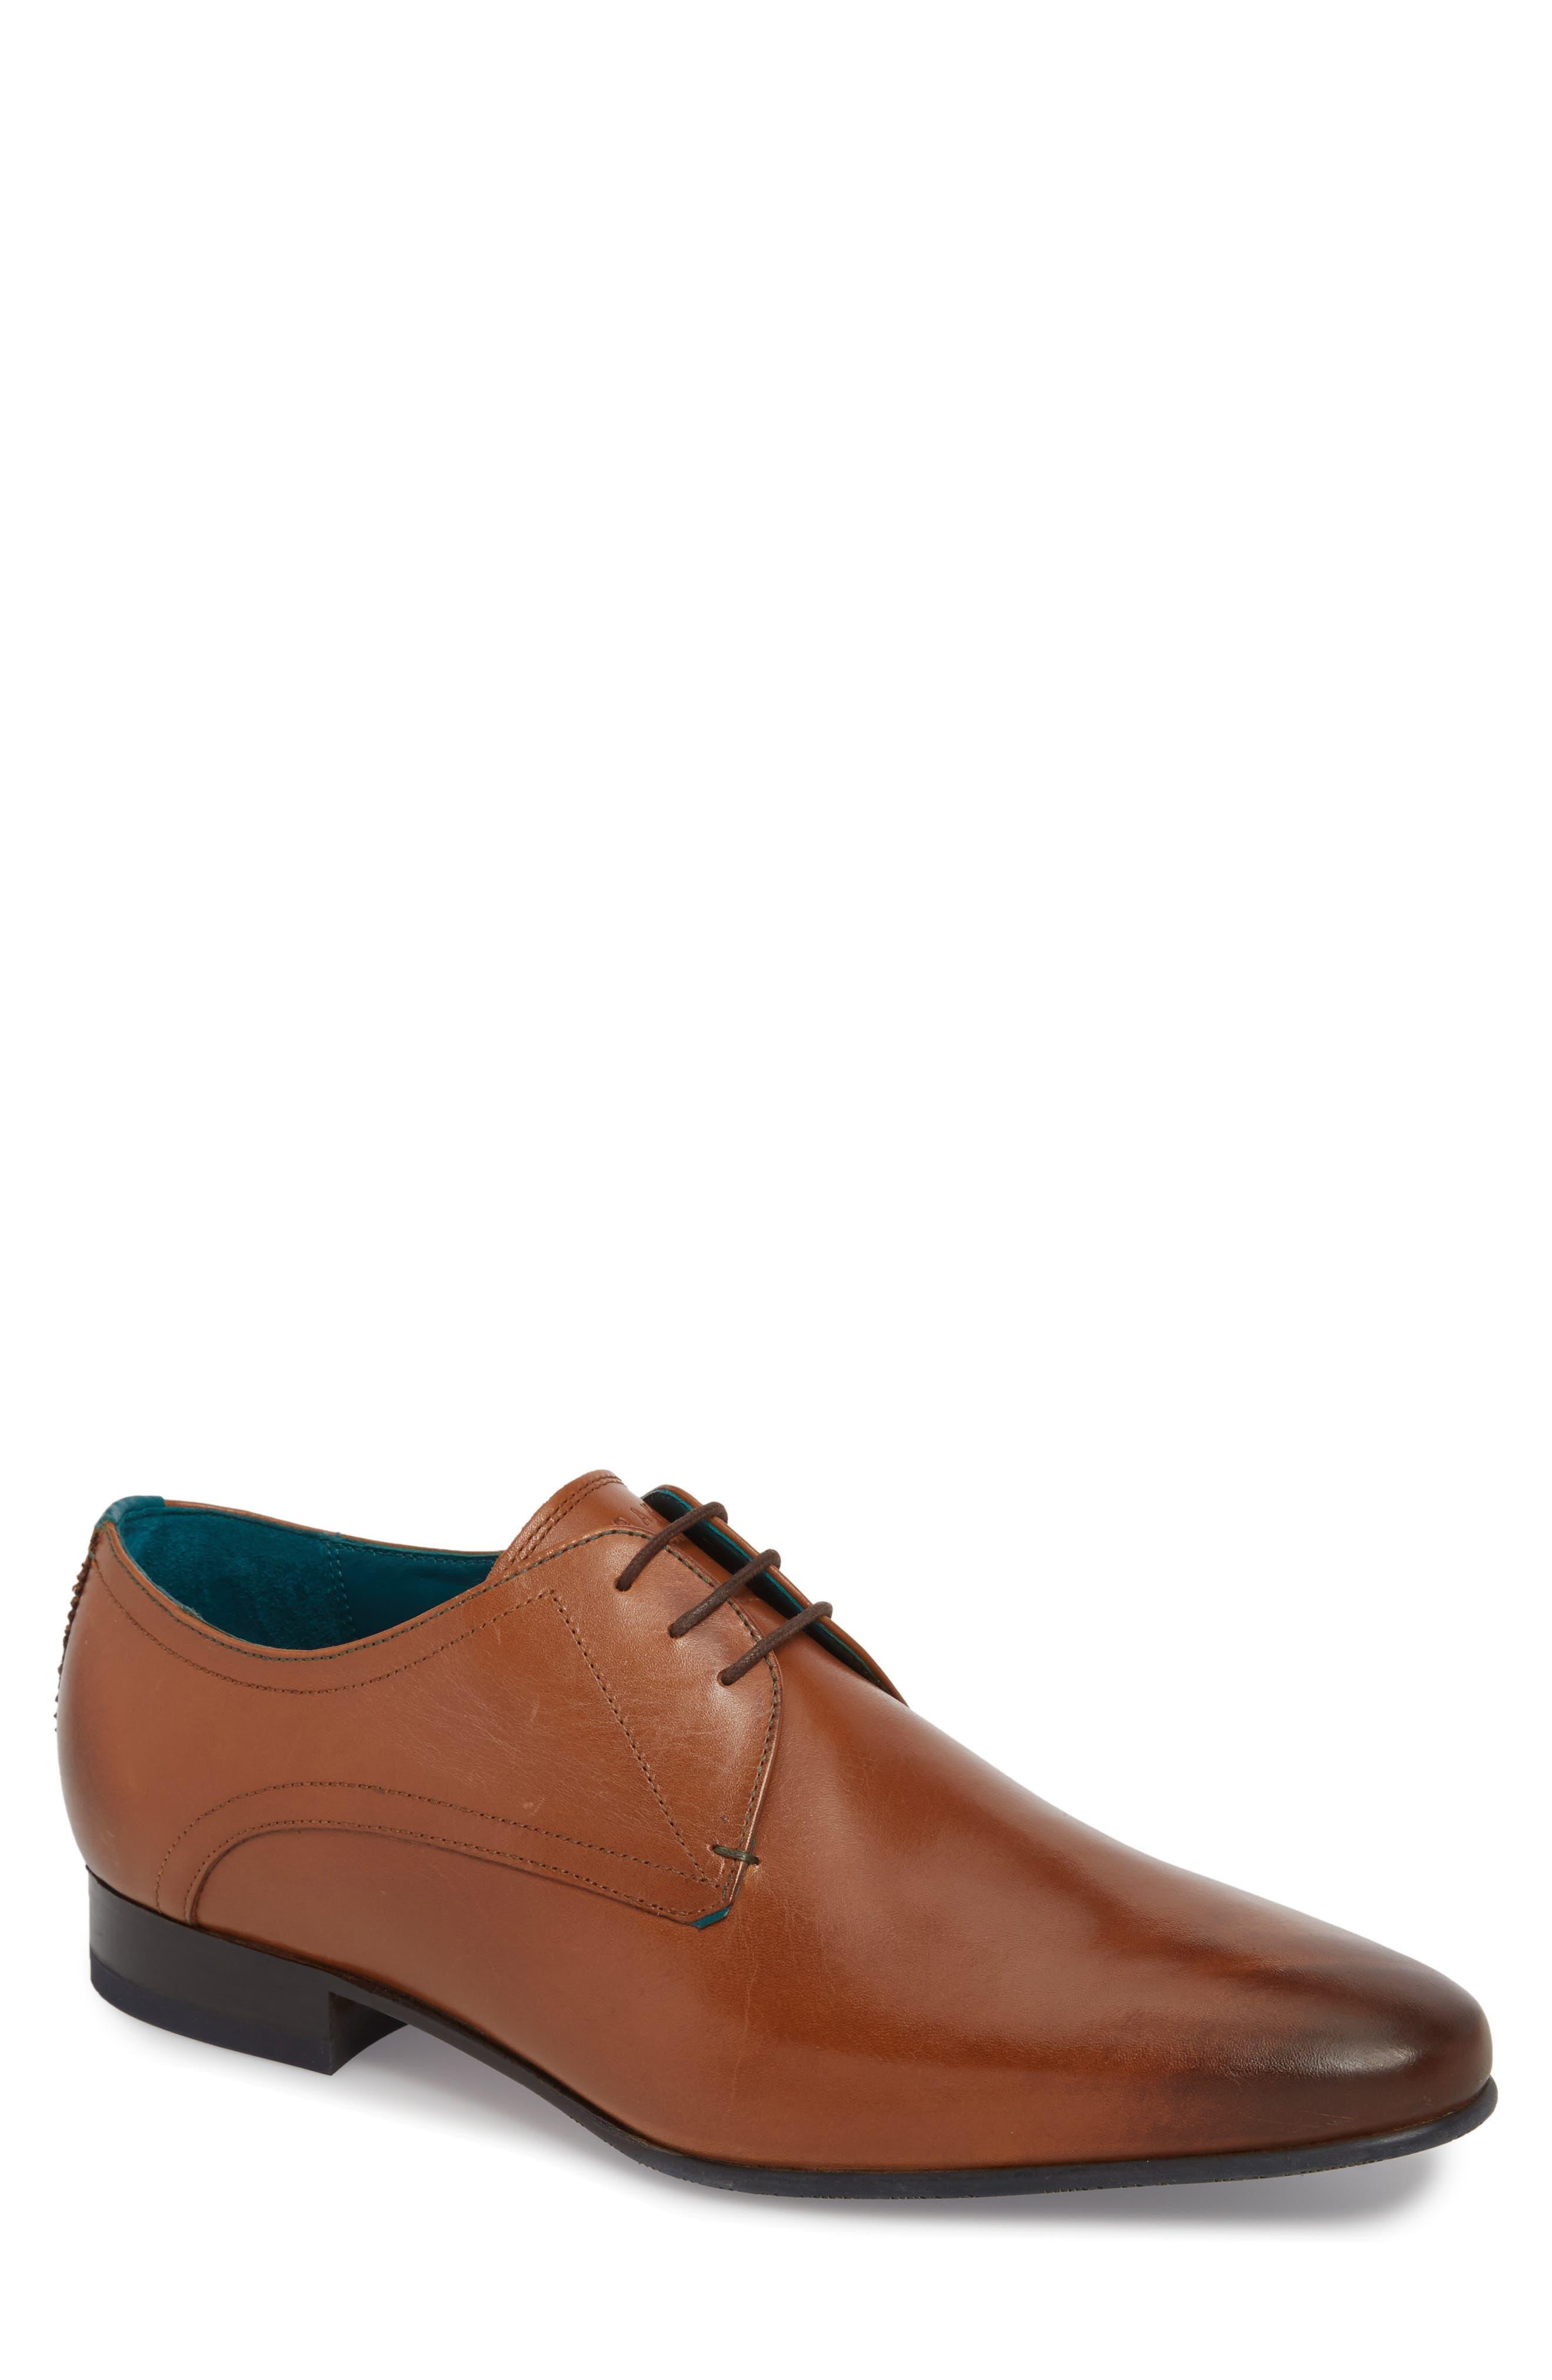 Bhartli Plain Toe Derby,                         Main,                         color, Tan Leather